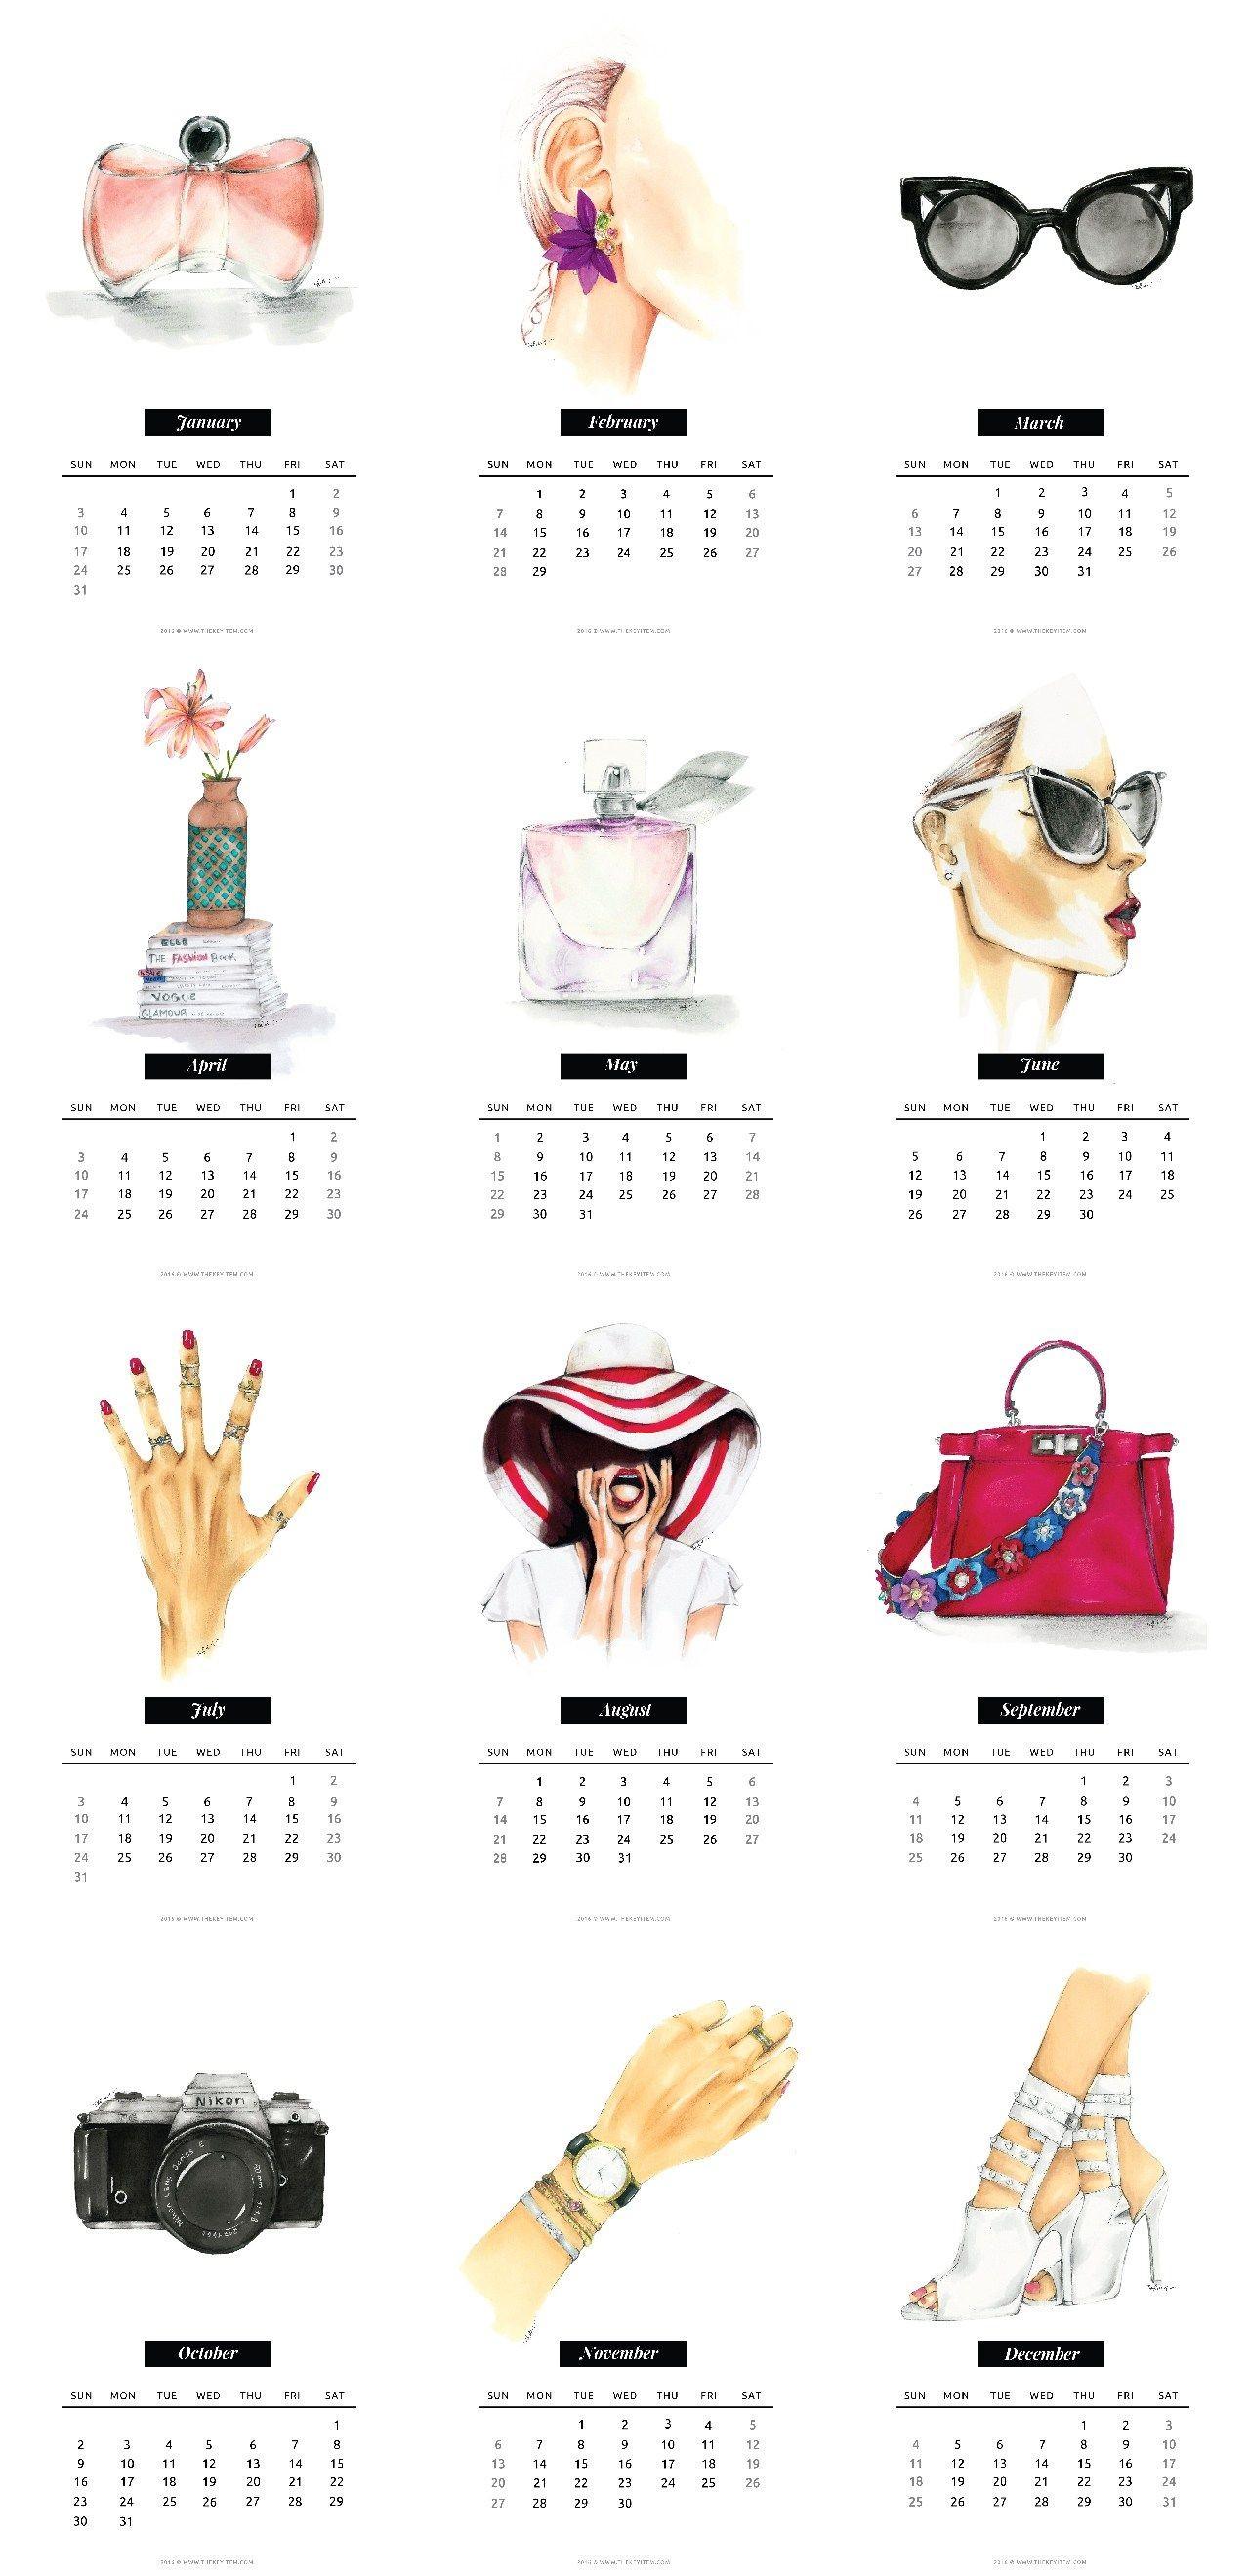 Imprimir Calendario 2019 Semanas Actual Calendario Ilustrado 2016 Gratis Ilustraciones Of Imprimir Calendario 2019 Semanas Más Actual 22 Best Bullet Journals Images On Pinterest